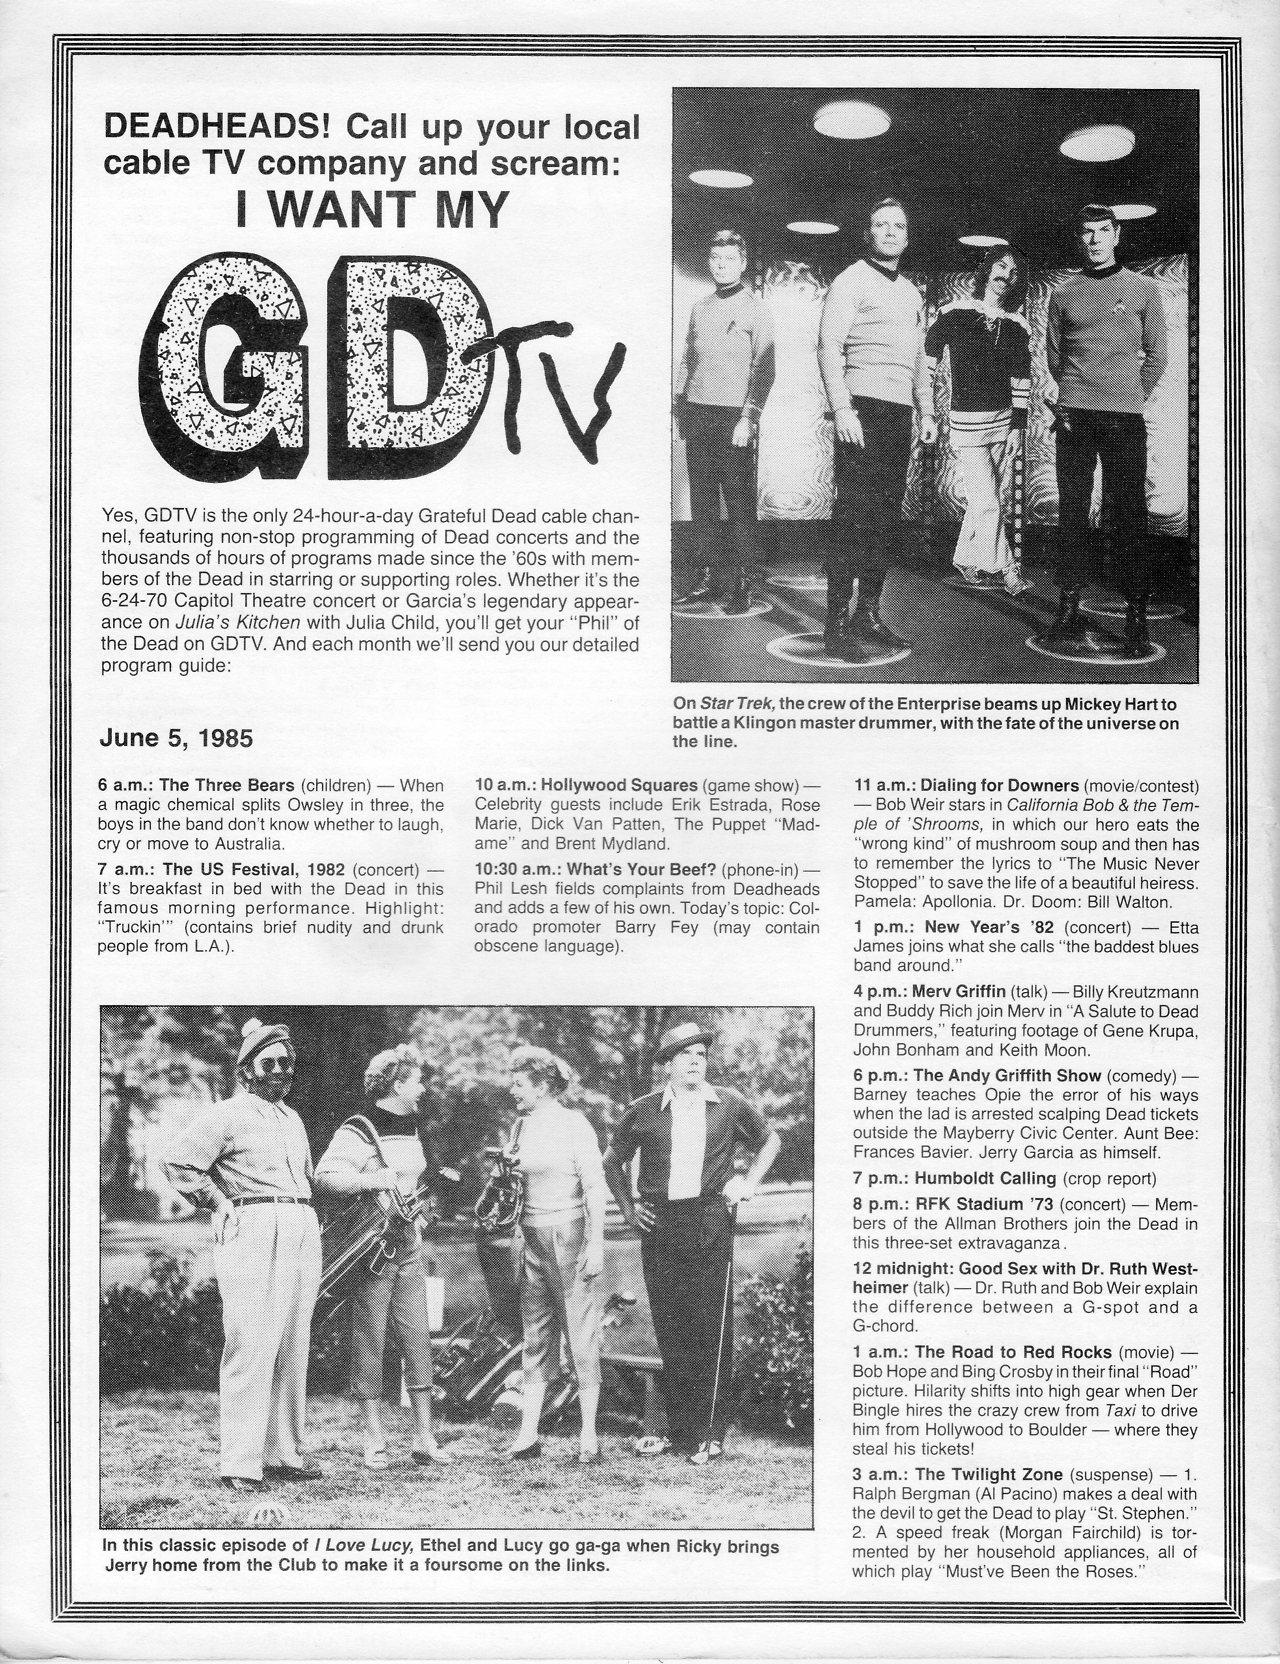 GDTV - Grateful Dead TV